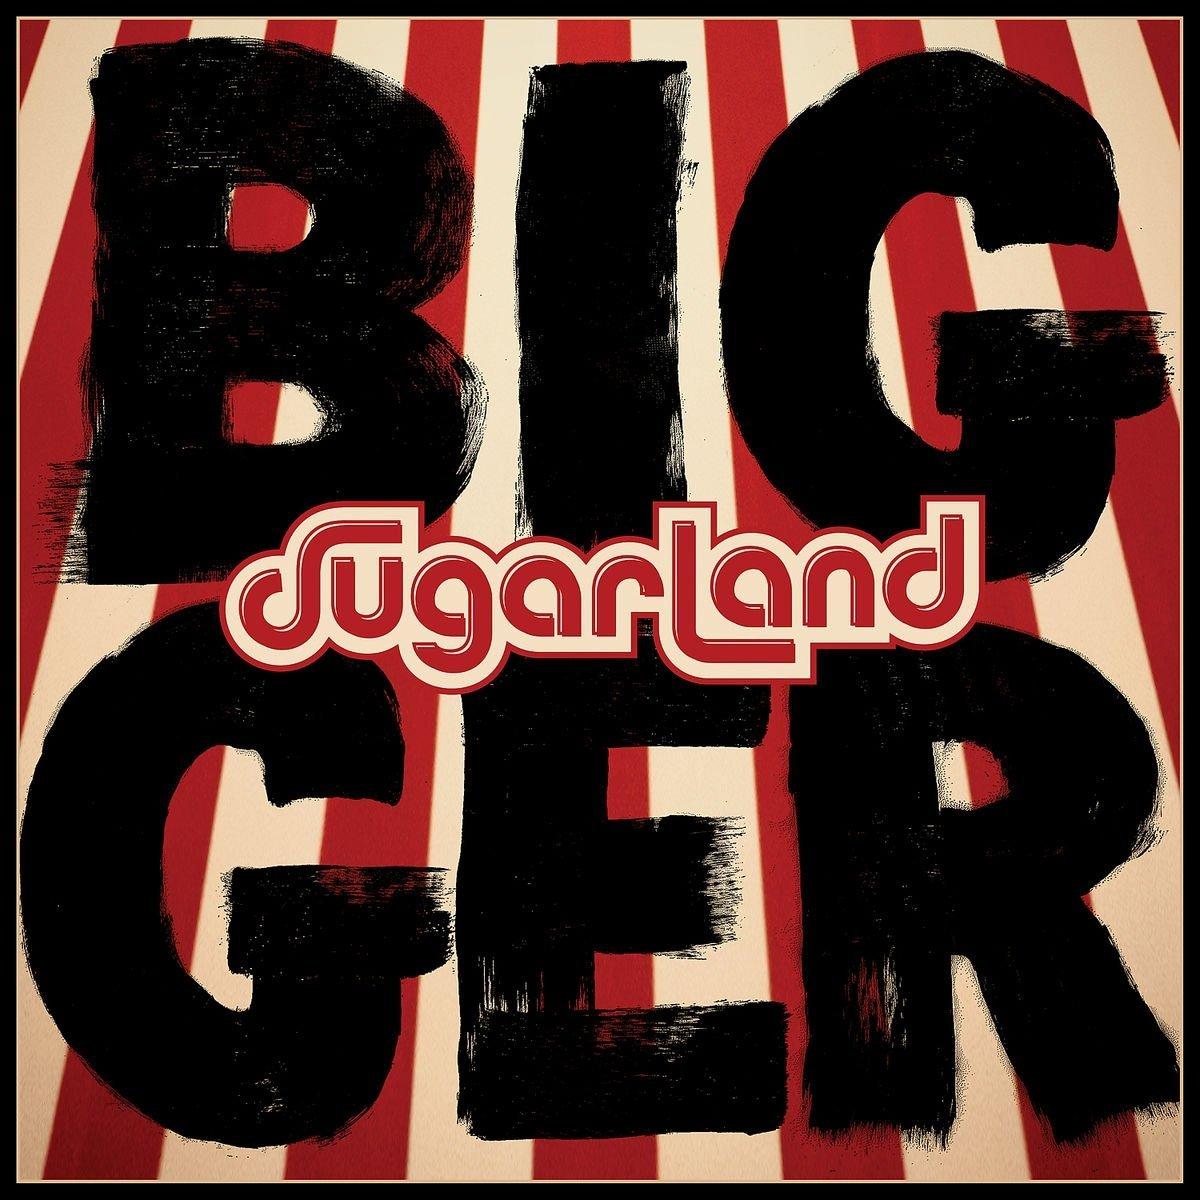 Sugarland - Bigger.jpg